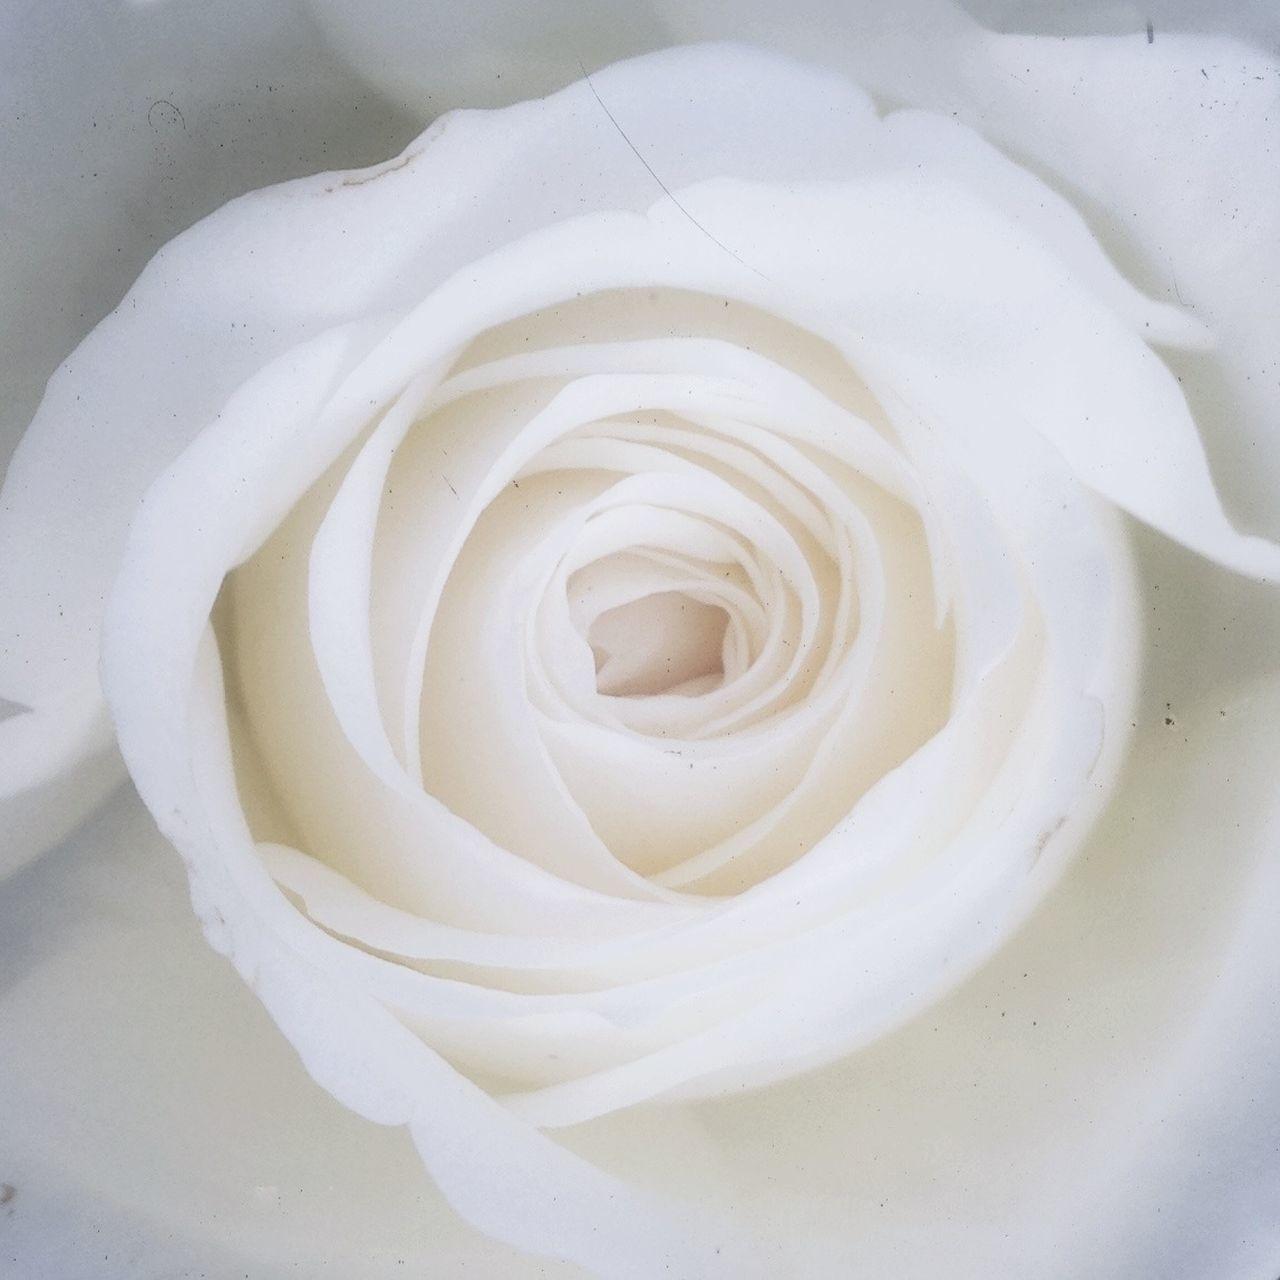 Detail shot of a white rose